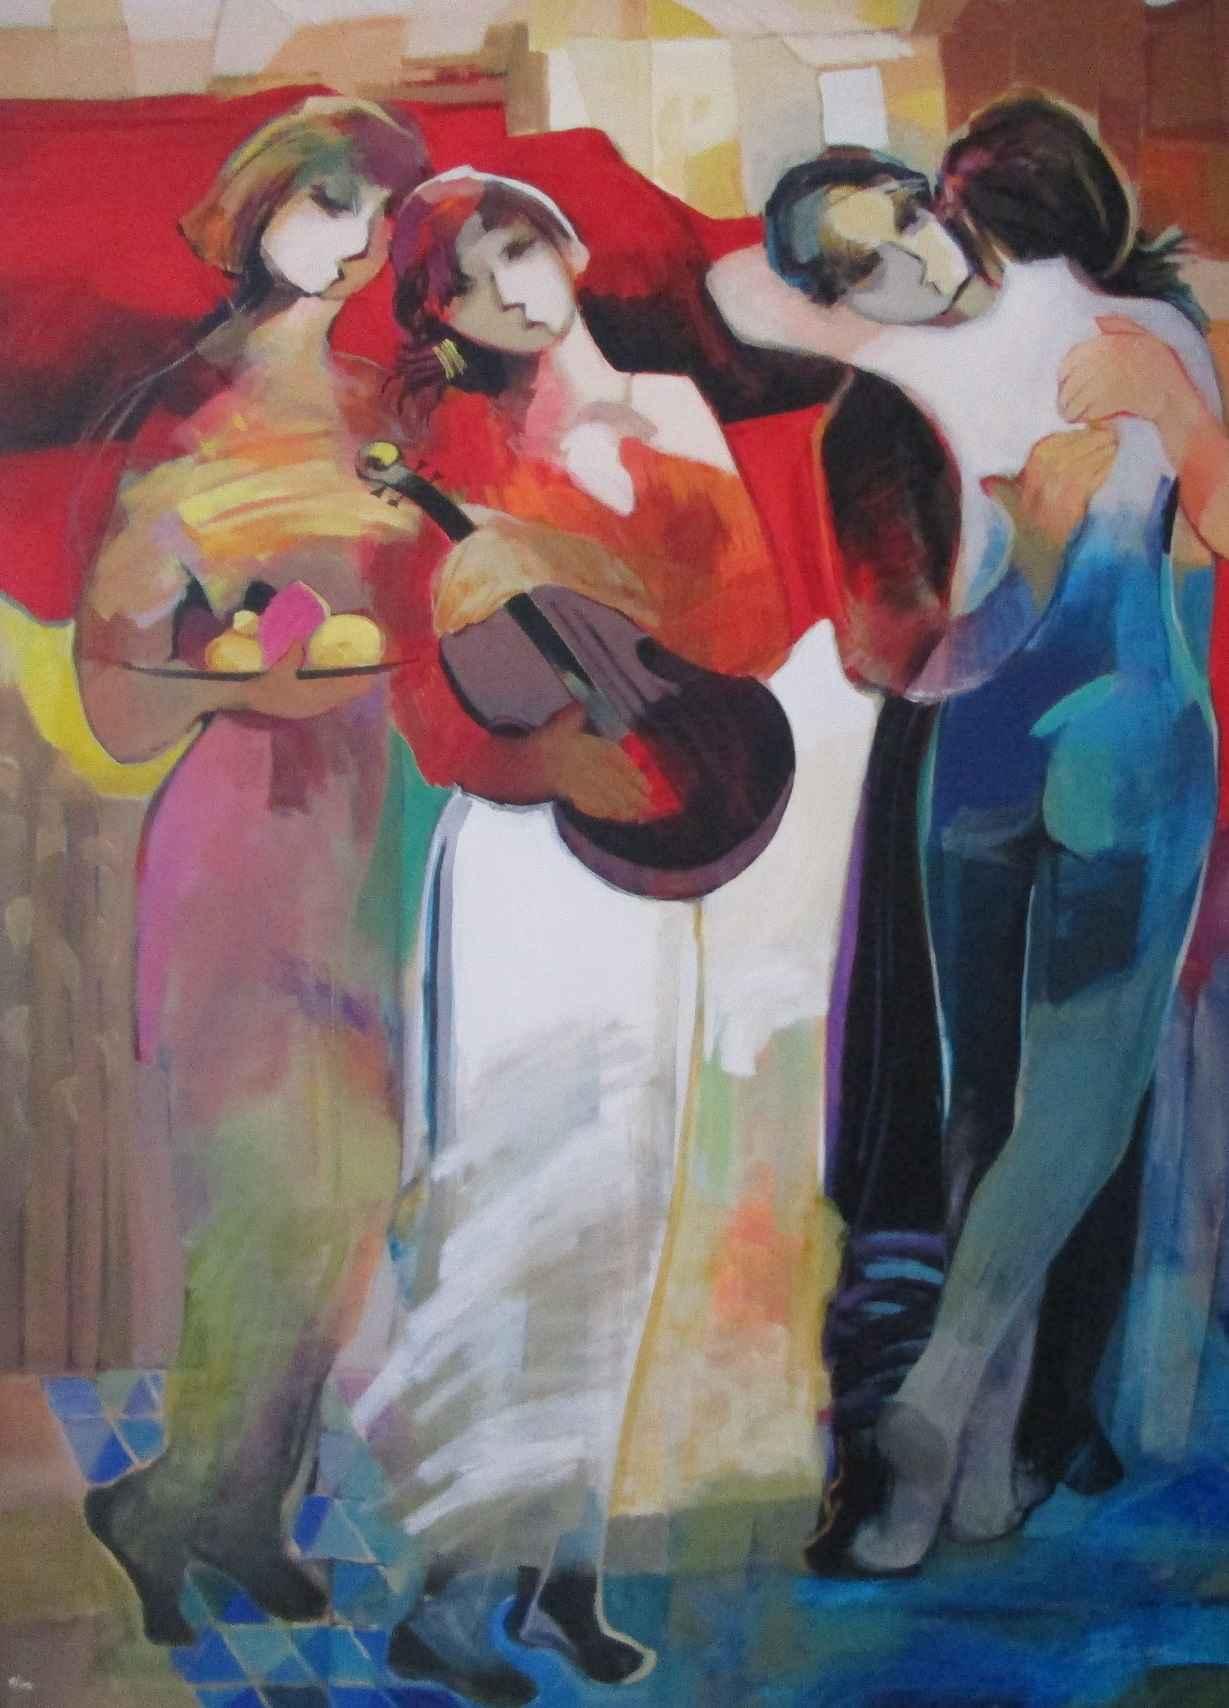 Morning Glory by  Hessam Abrishami - Masterpiece Online